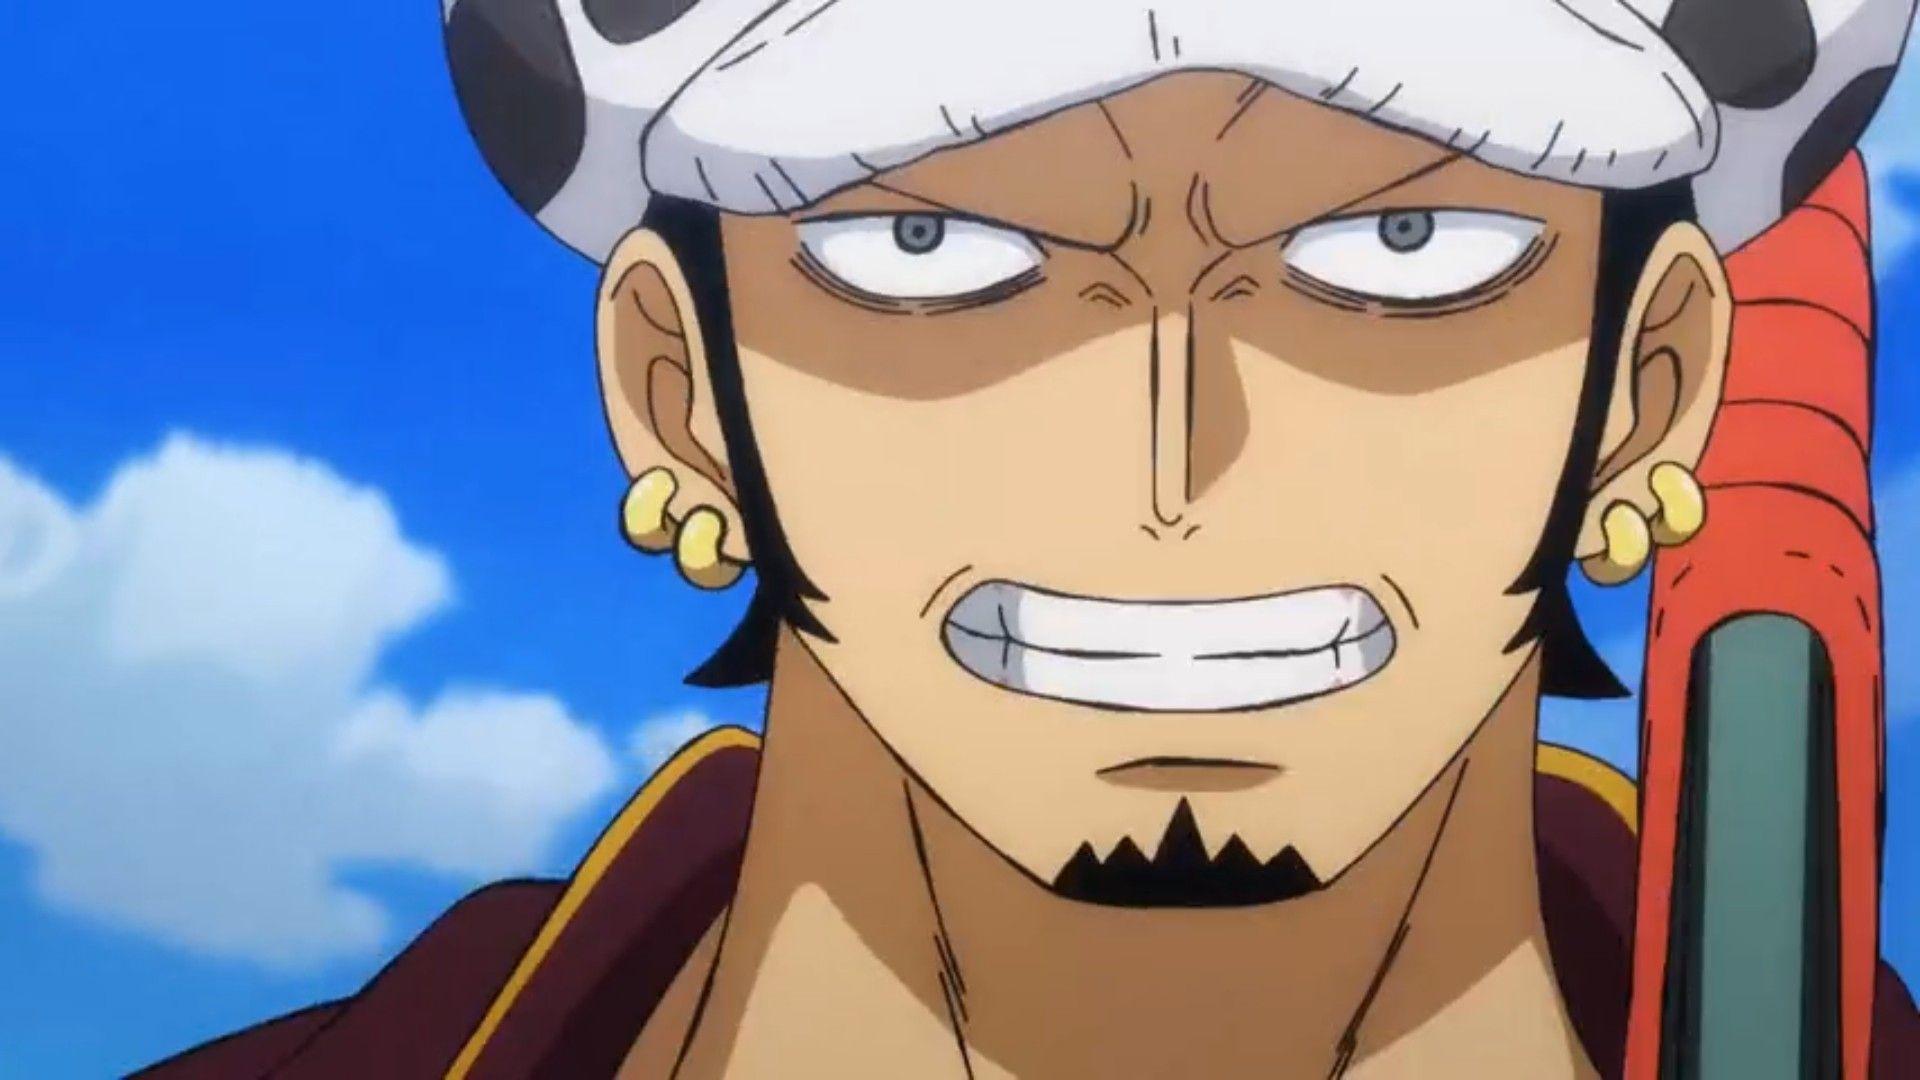 Pin By Fabrizia On Law Anime One Piece Anime Chibi Trafalgar Law